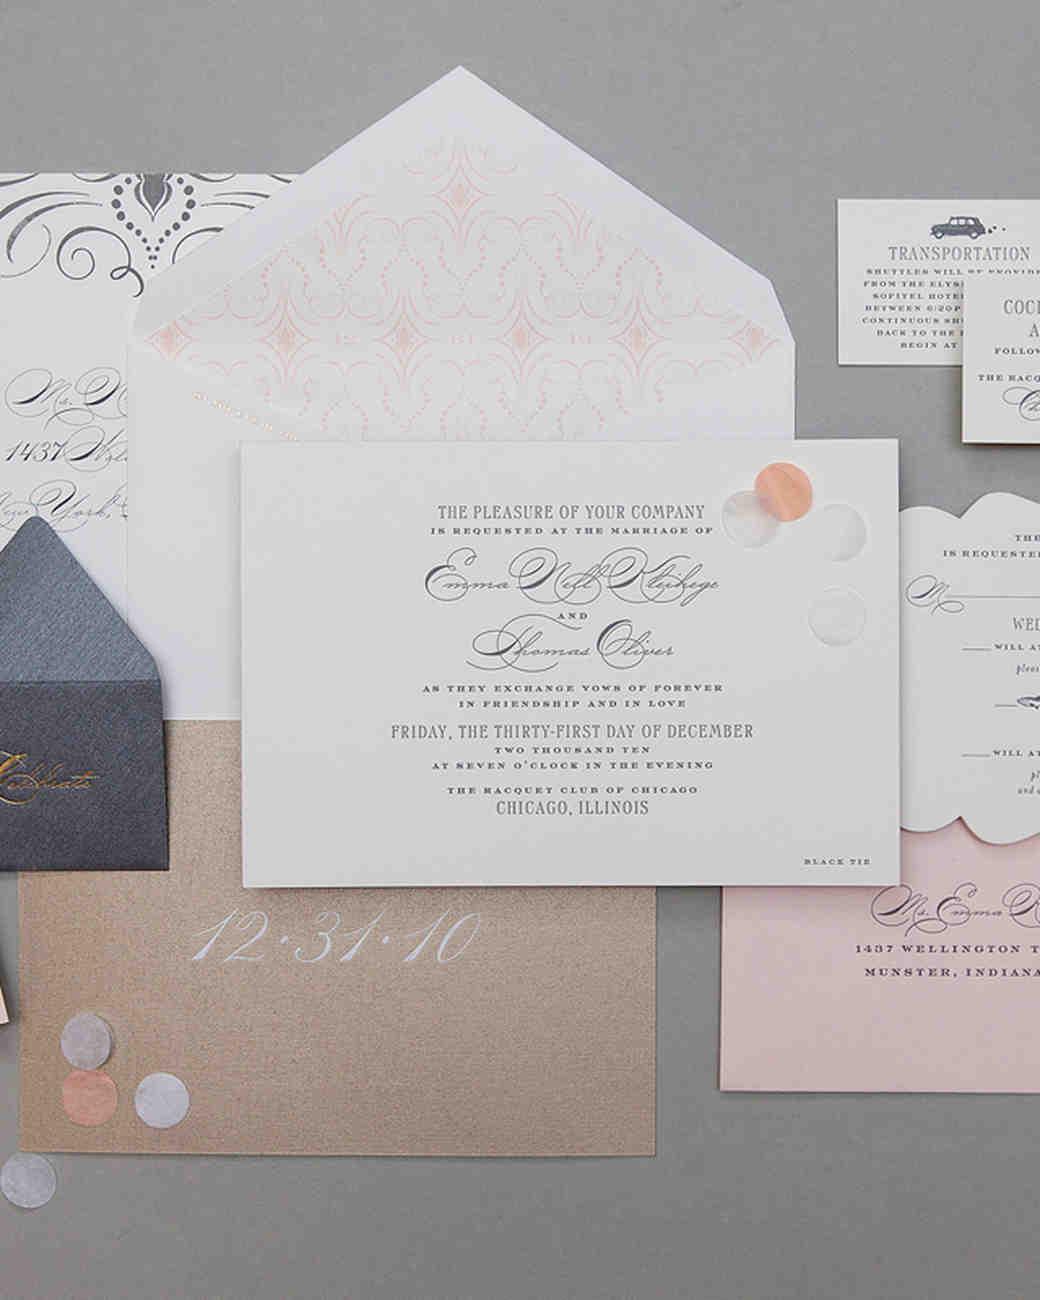 classic-invitation-5.jpg